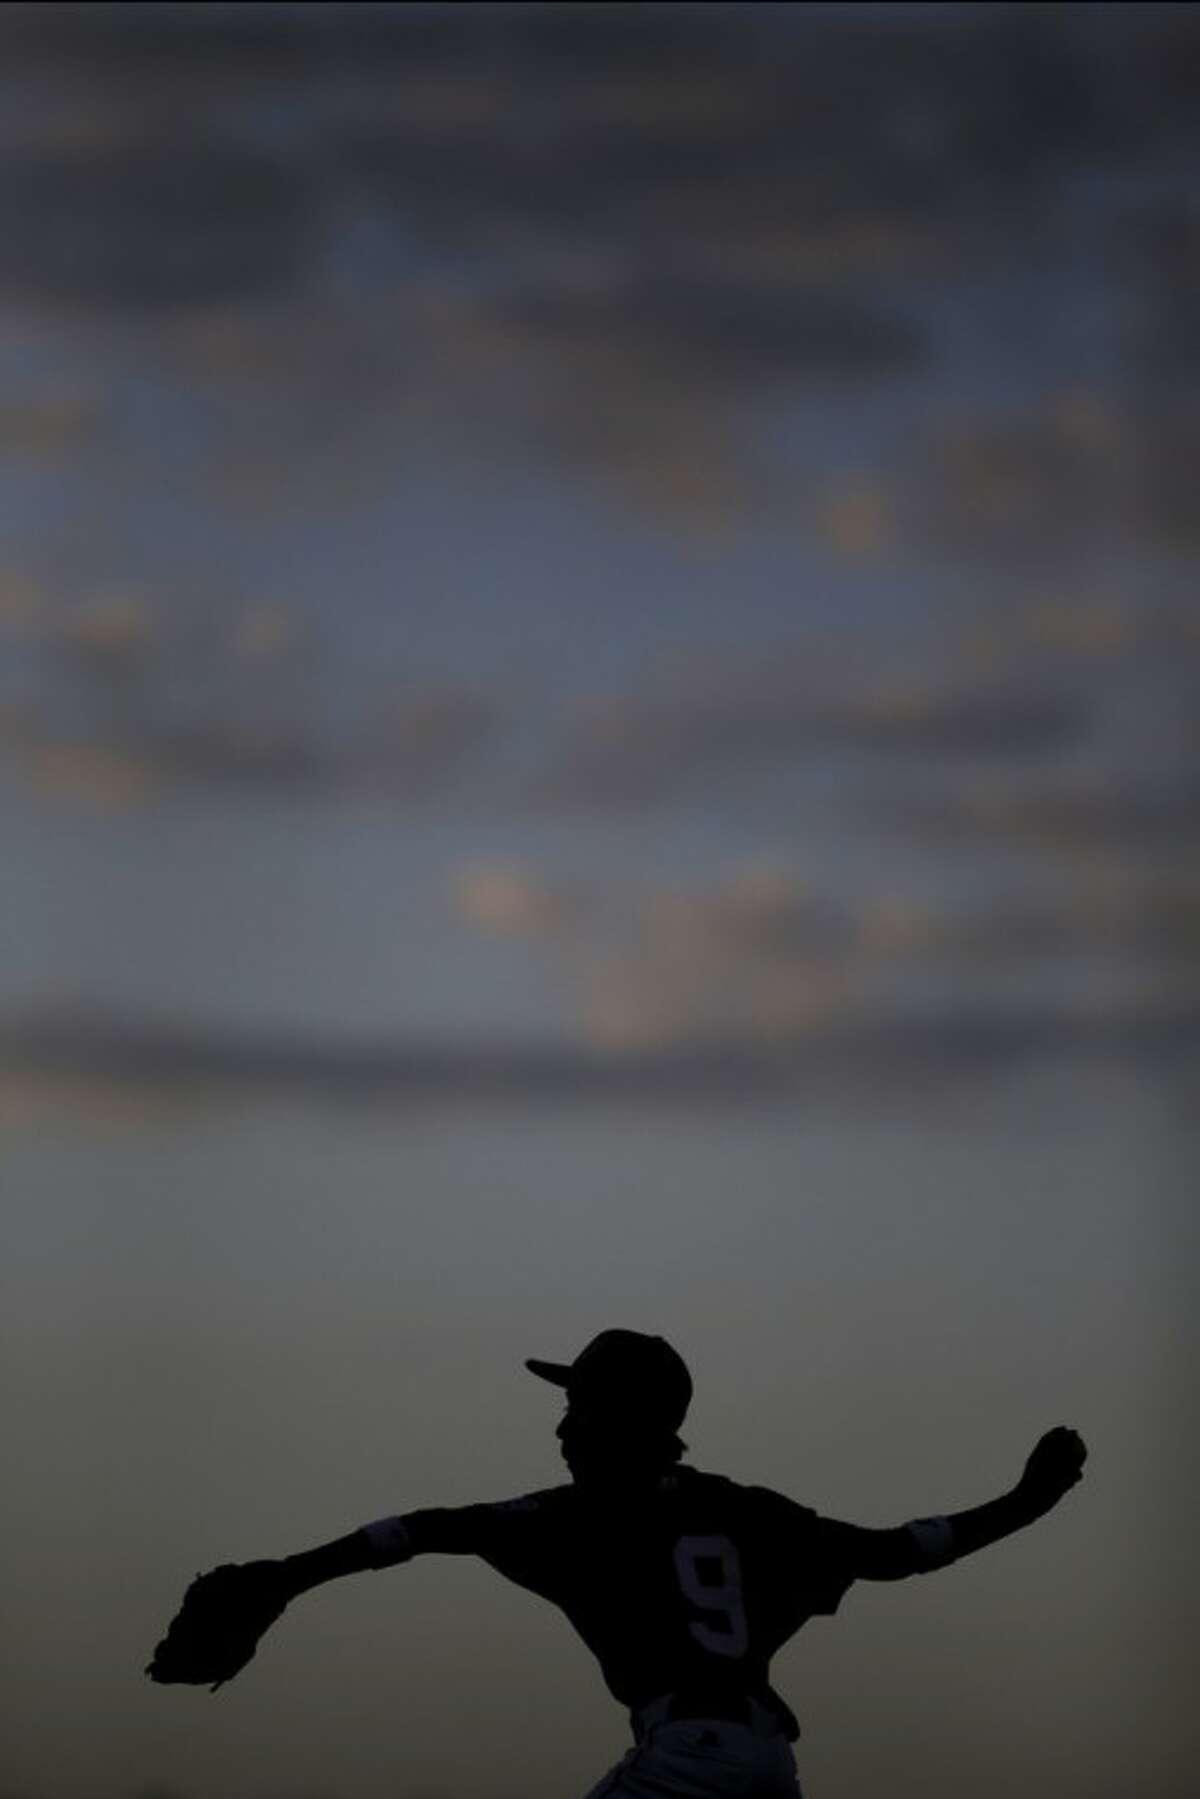 Nuevo Laredo, Mexico's Joel Turrubiates pitches in the fourth inning of a pool play baseball game against Lugazi, Uganda at the Little League World Series, Saturday, Aug. 18, 2012, in South Williamsport, Pa. Mexico won 12-0. (AP Photo/Matt Slocum)